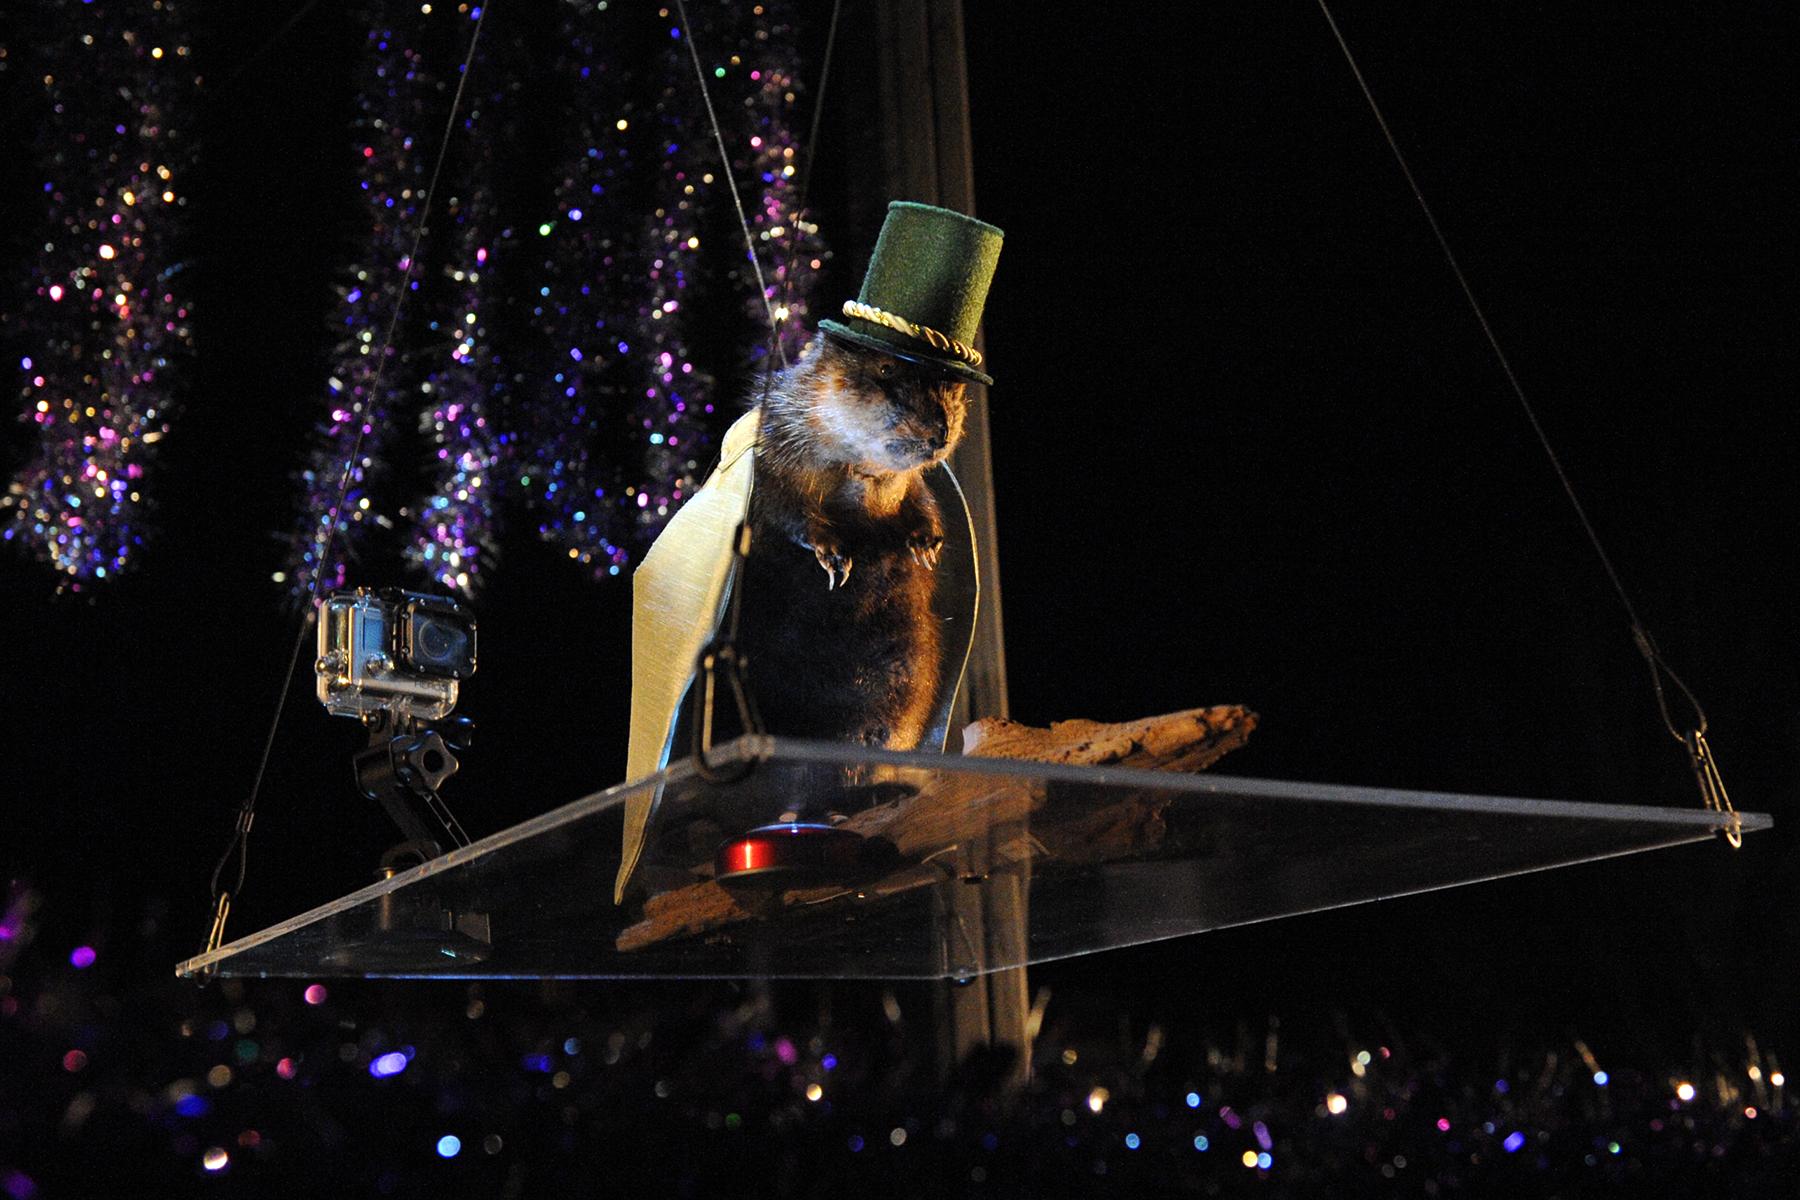 Marshall Muskrat on New Year's Eve